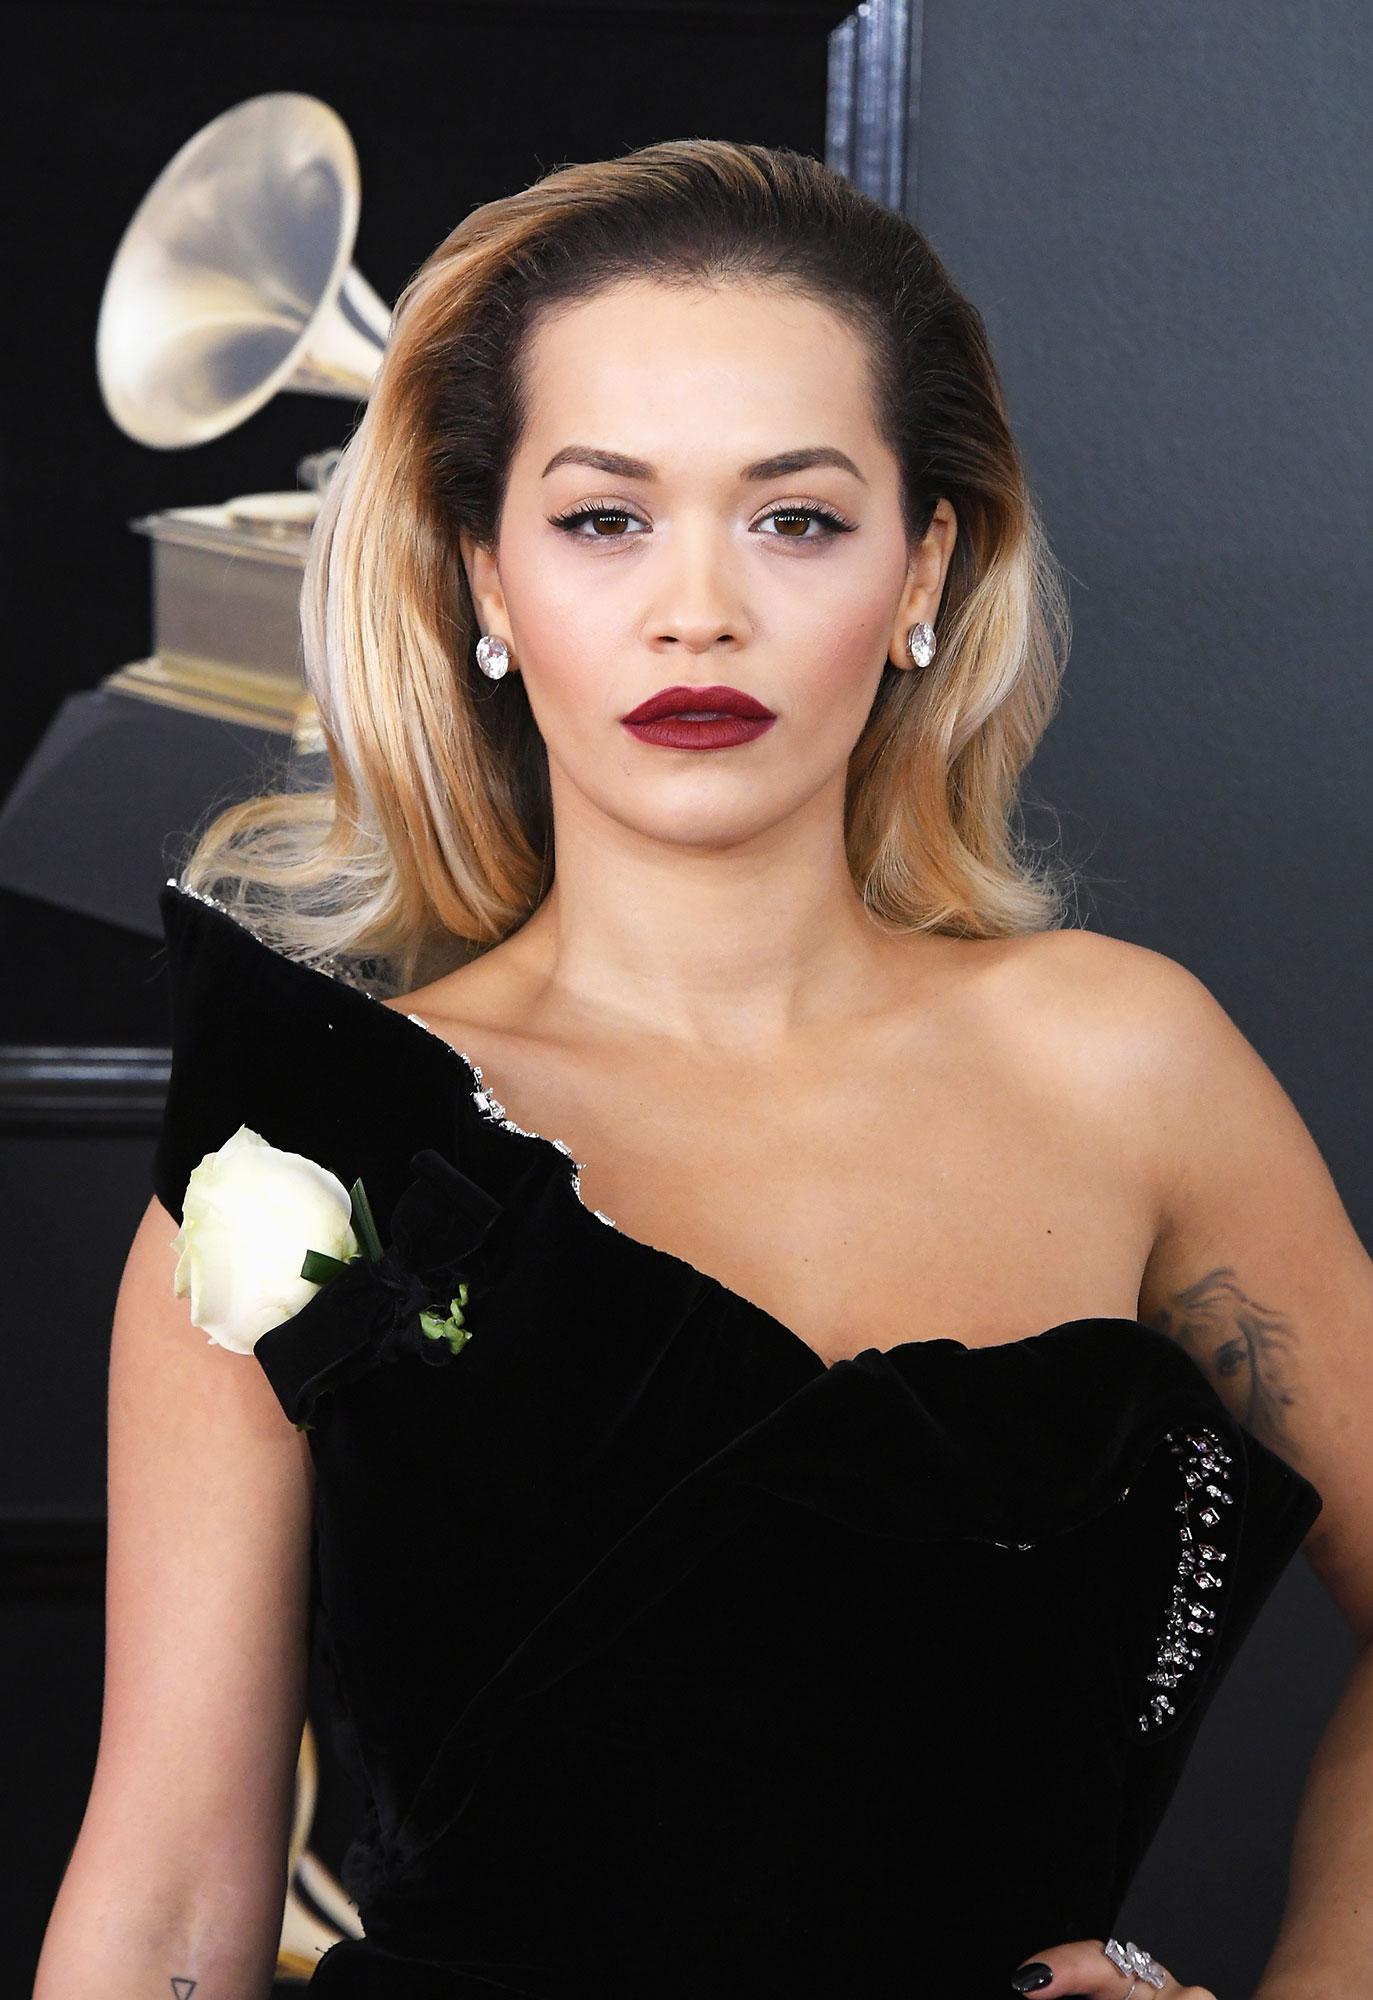 Rita Ora - Recording artist Rita Ora attends the 60th Annual GRAMMY Awards at Madison Square Garden on January 28, 2018 in New York City.